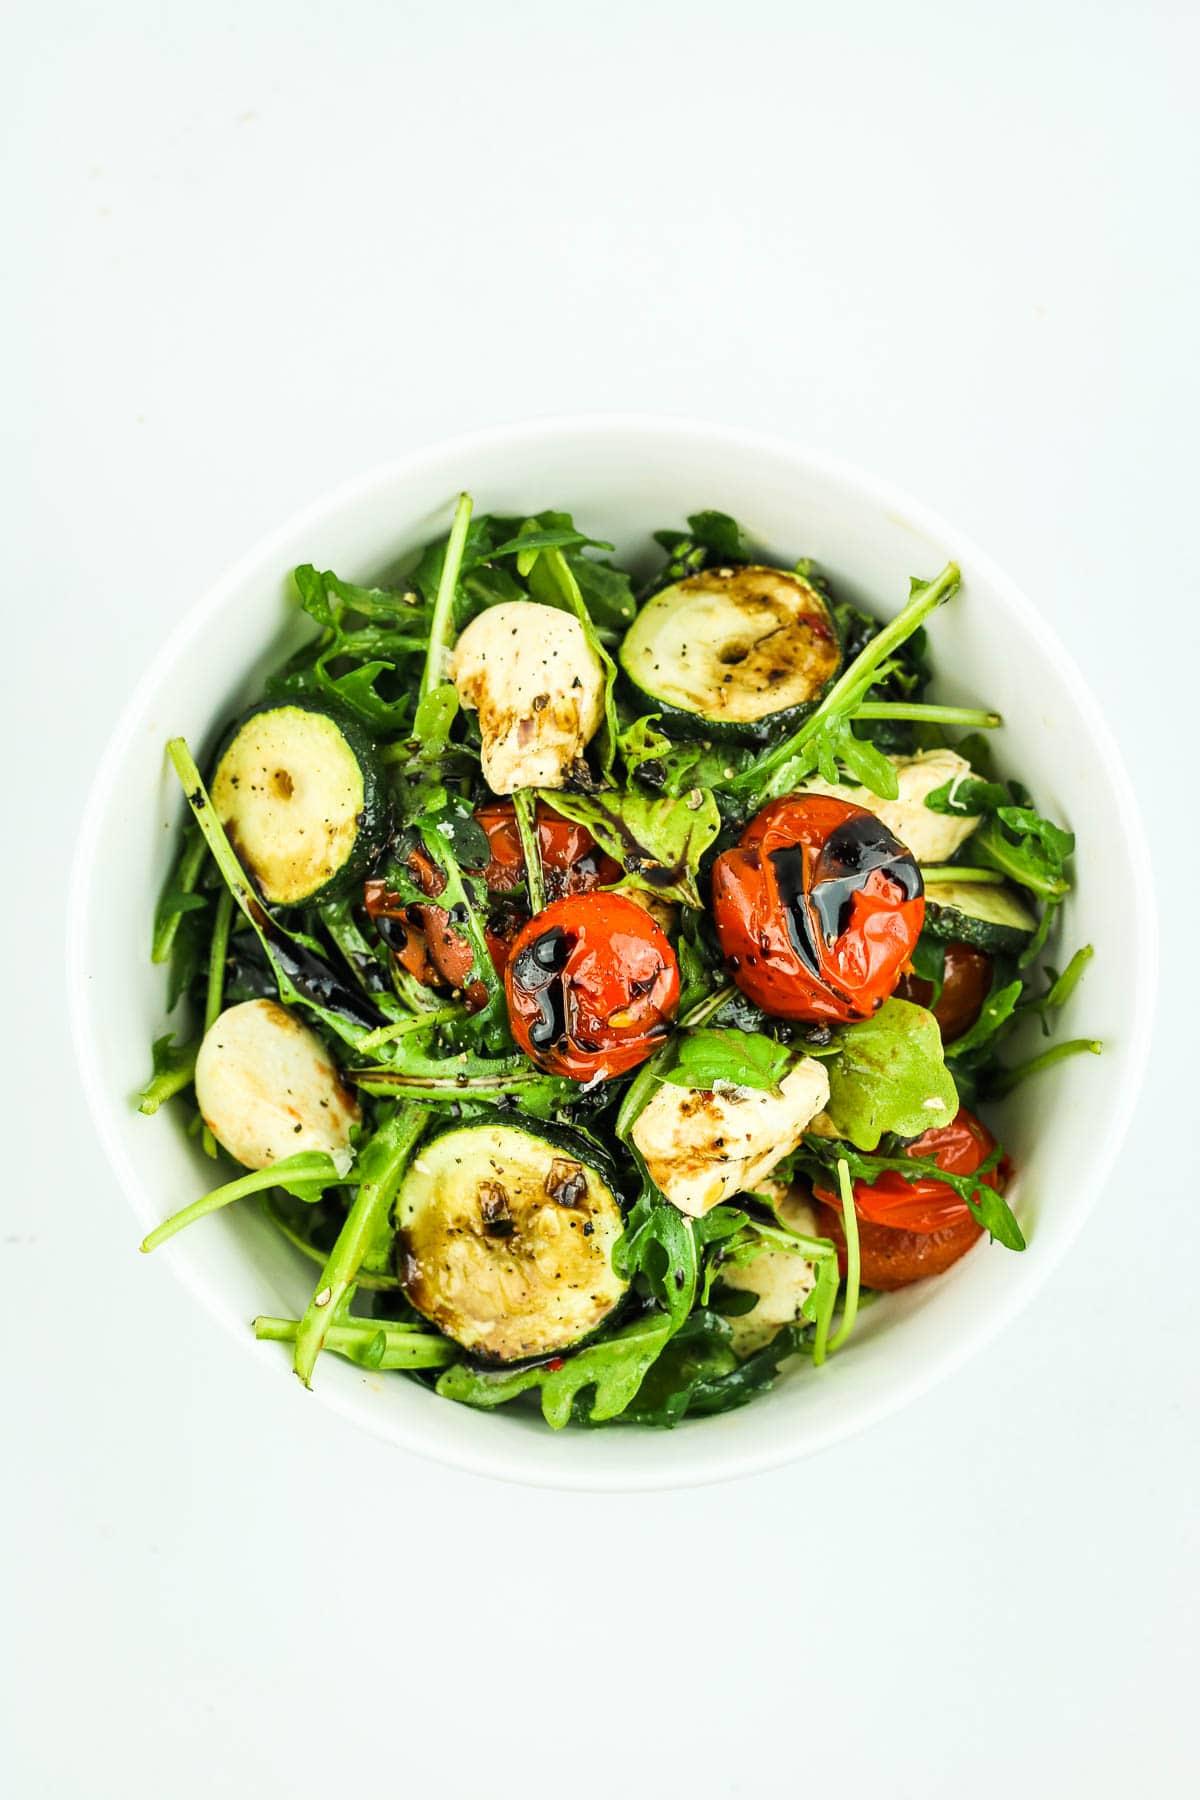 Grilled Zucchini Caprese Salad – SUMMER favorite. This caprese salad recipe has arugula, grilled tomatoes, grilled zucchini, and marinated mozzarella – plus a balsamic glaze. SO good. #salad #bbq #caprese #summer